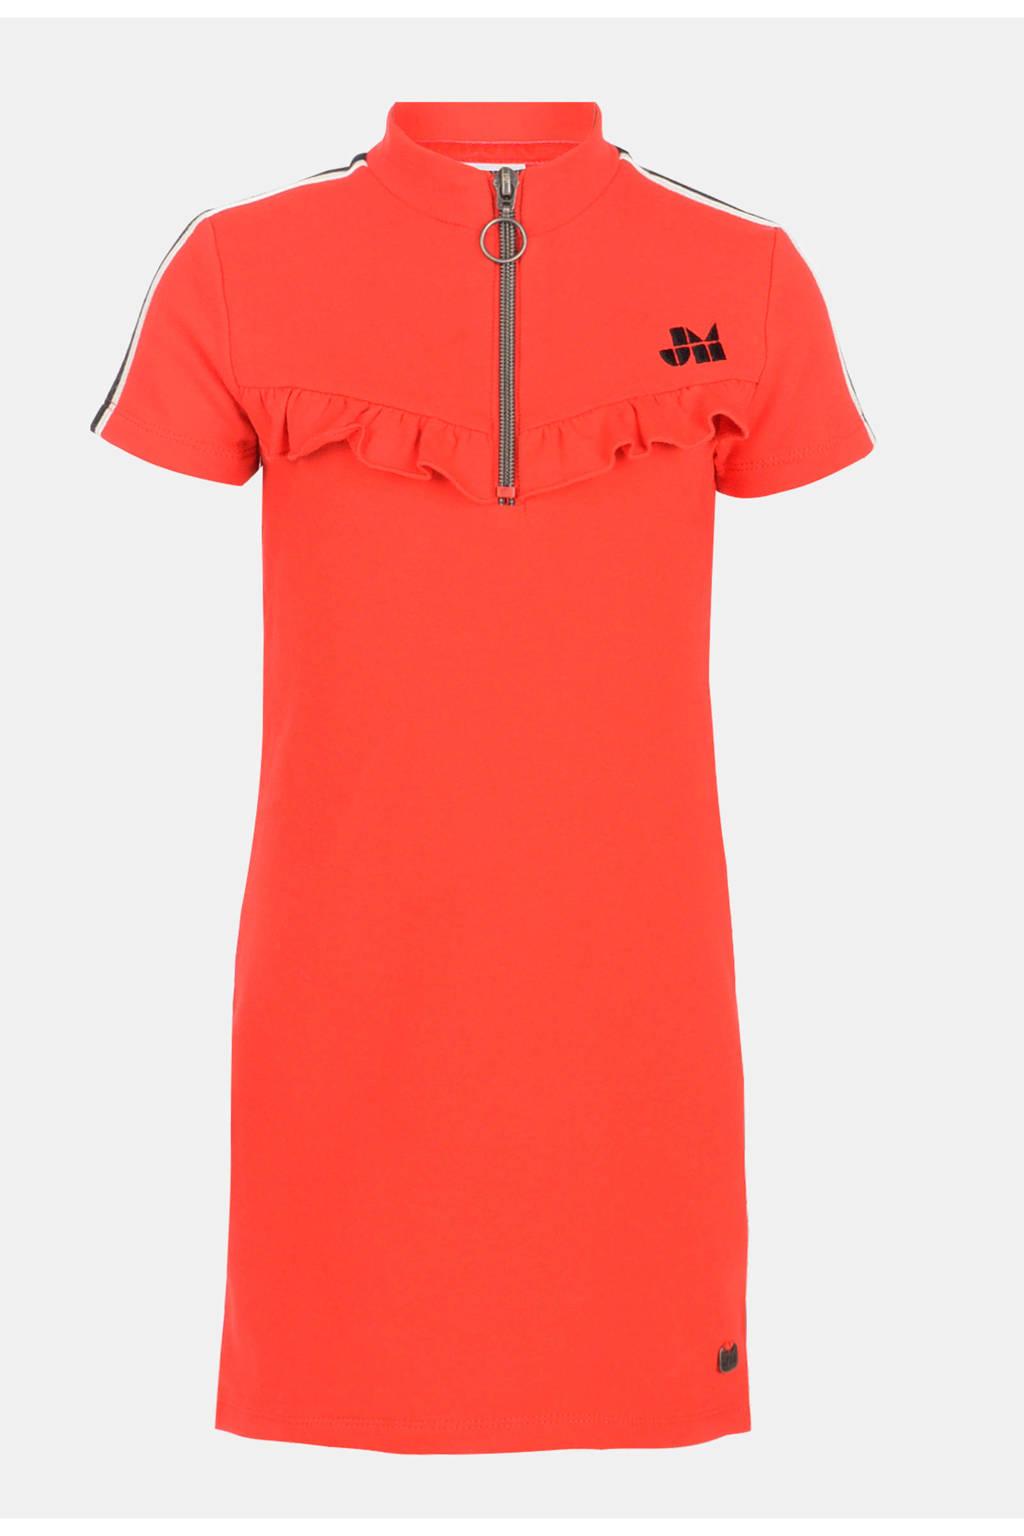 Jill jersey jurk Cathey met contrastbies en ruches rood, Rood